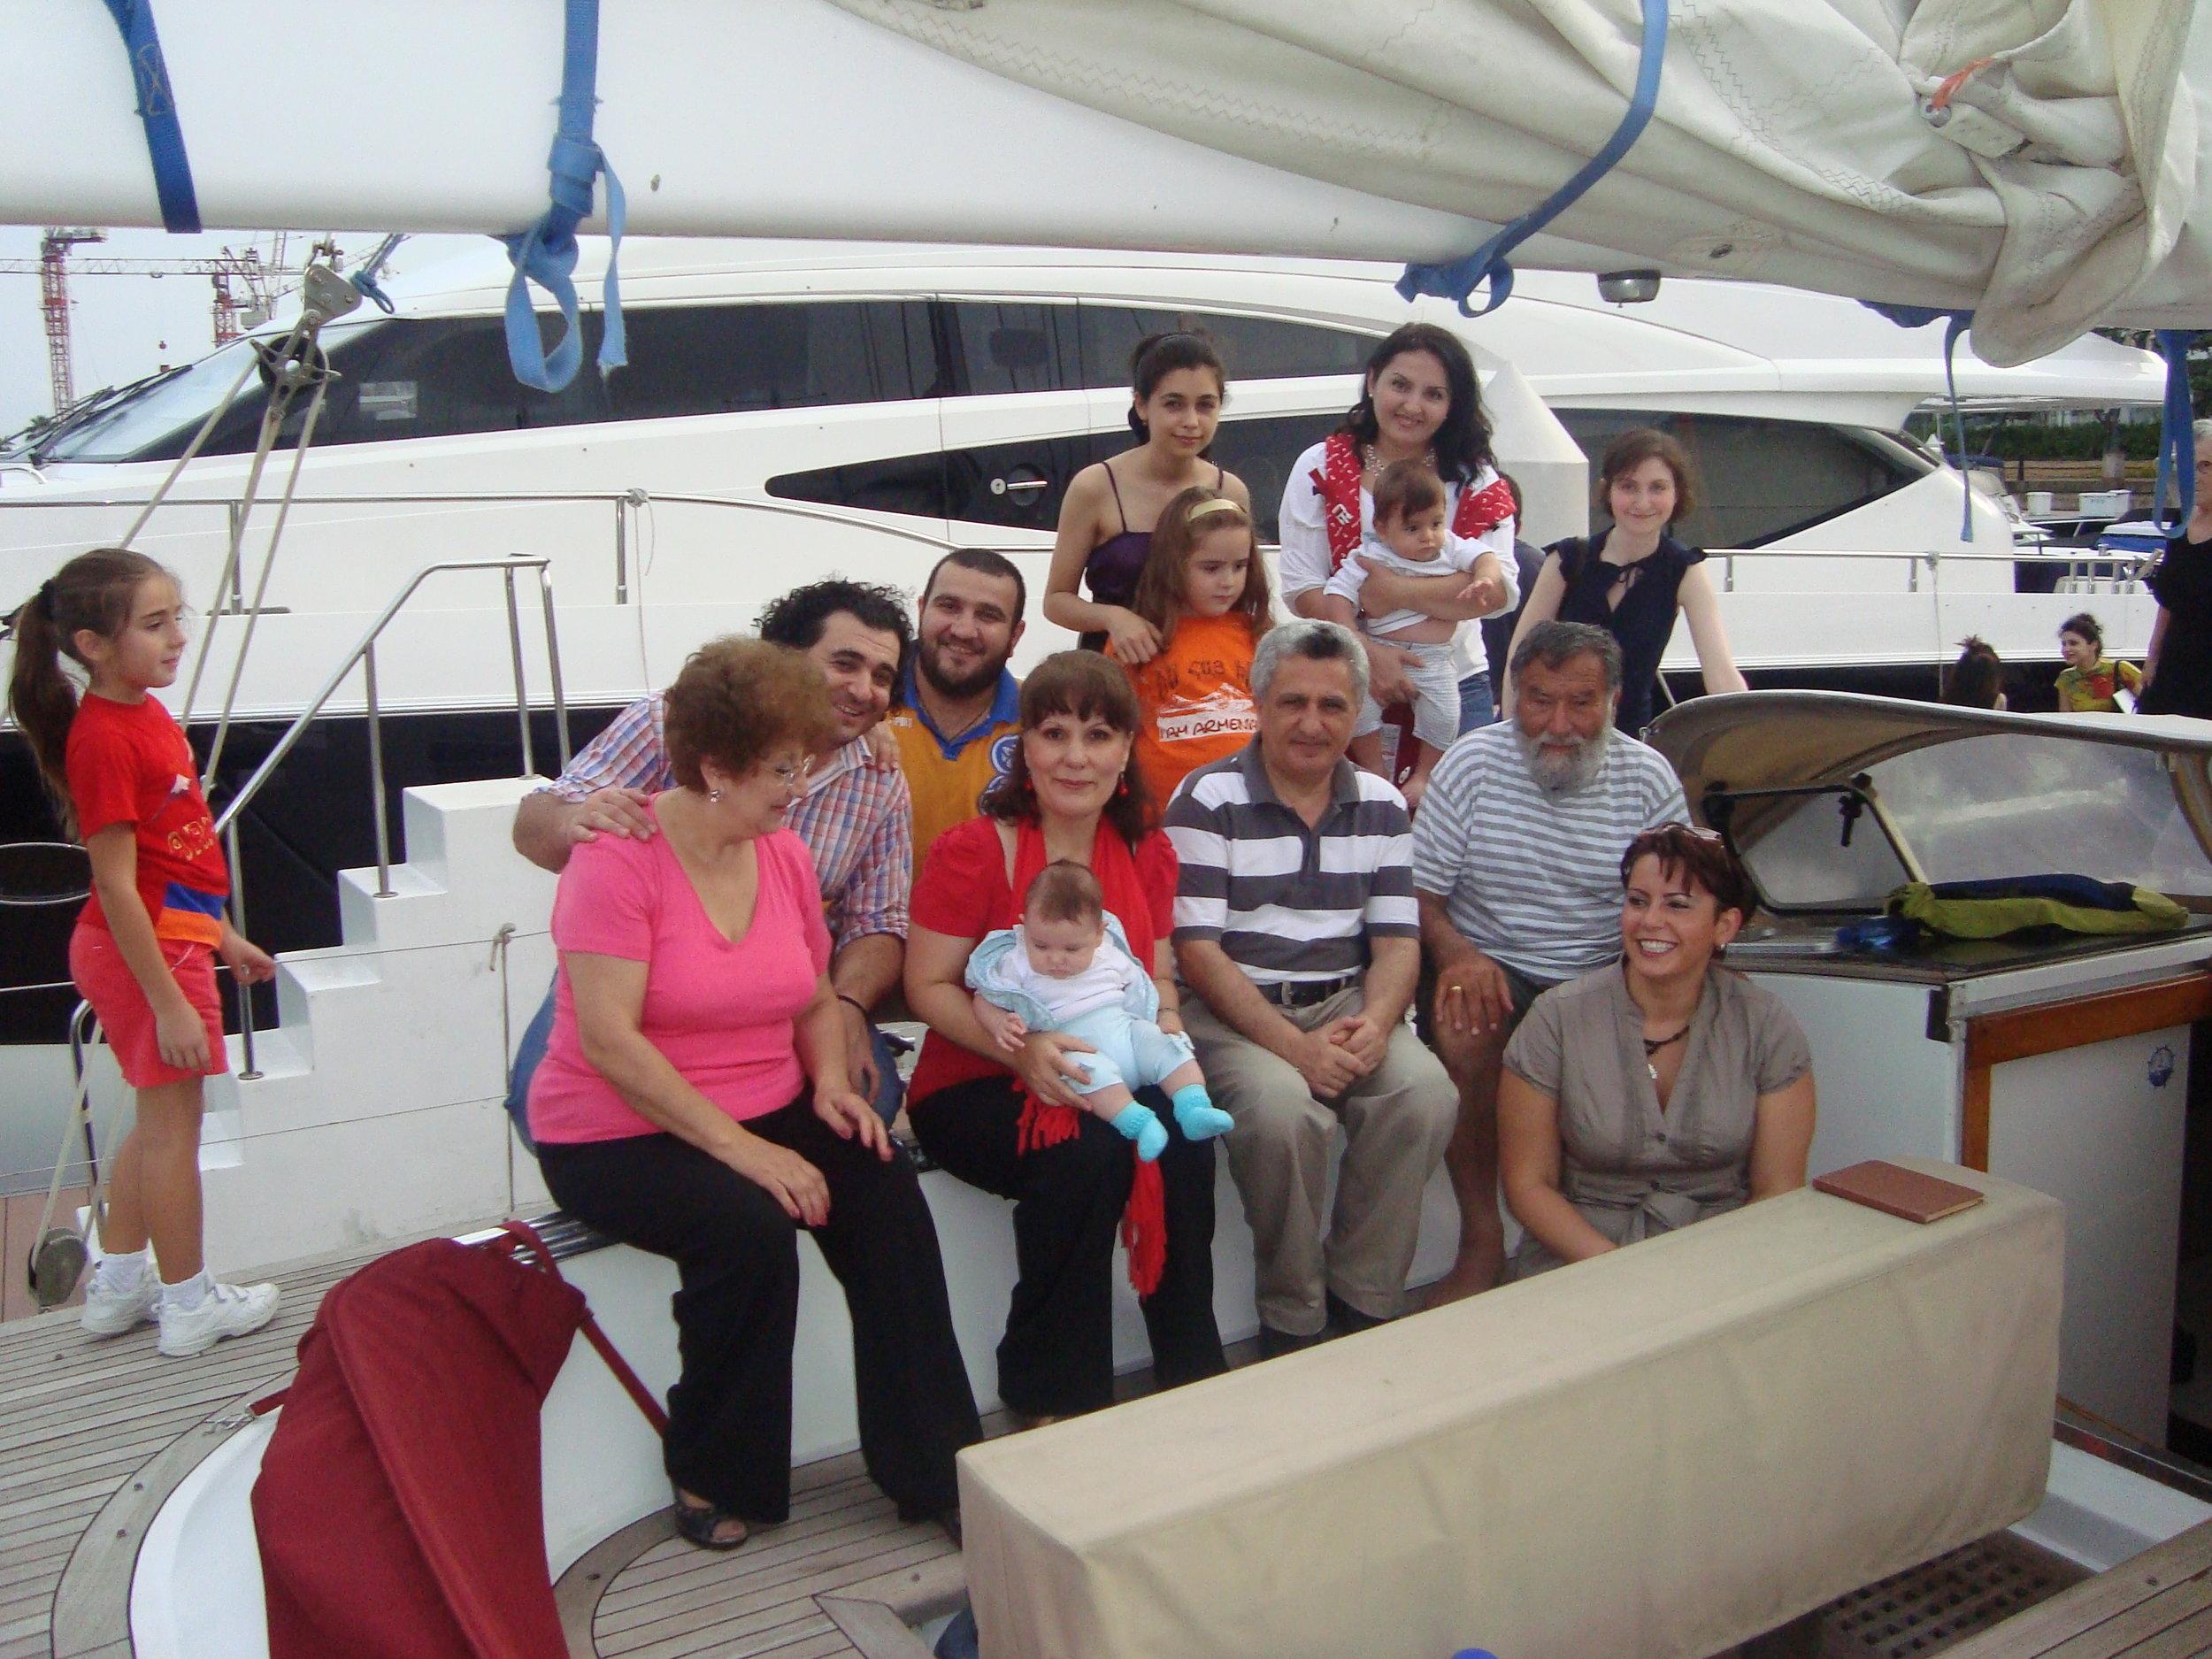 2011-06-09-welcoming-armenia-to-singapore.jpg